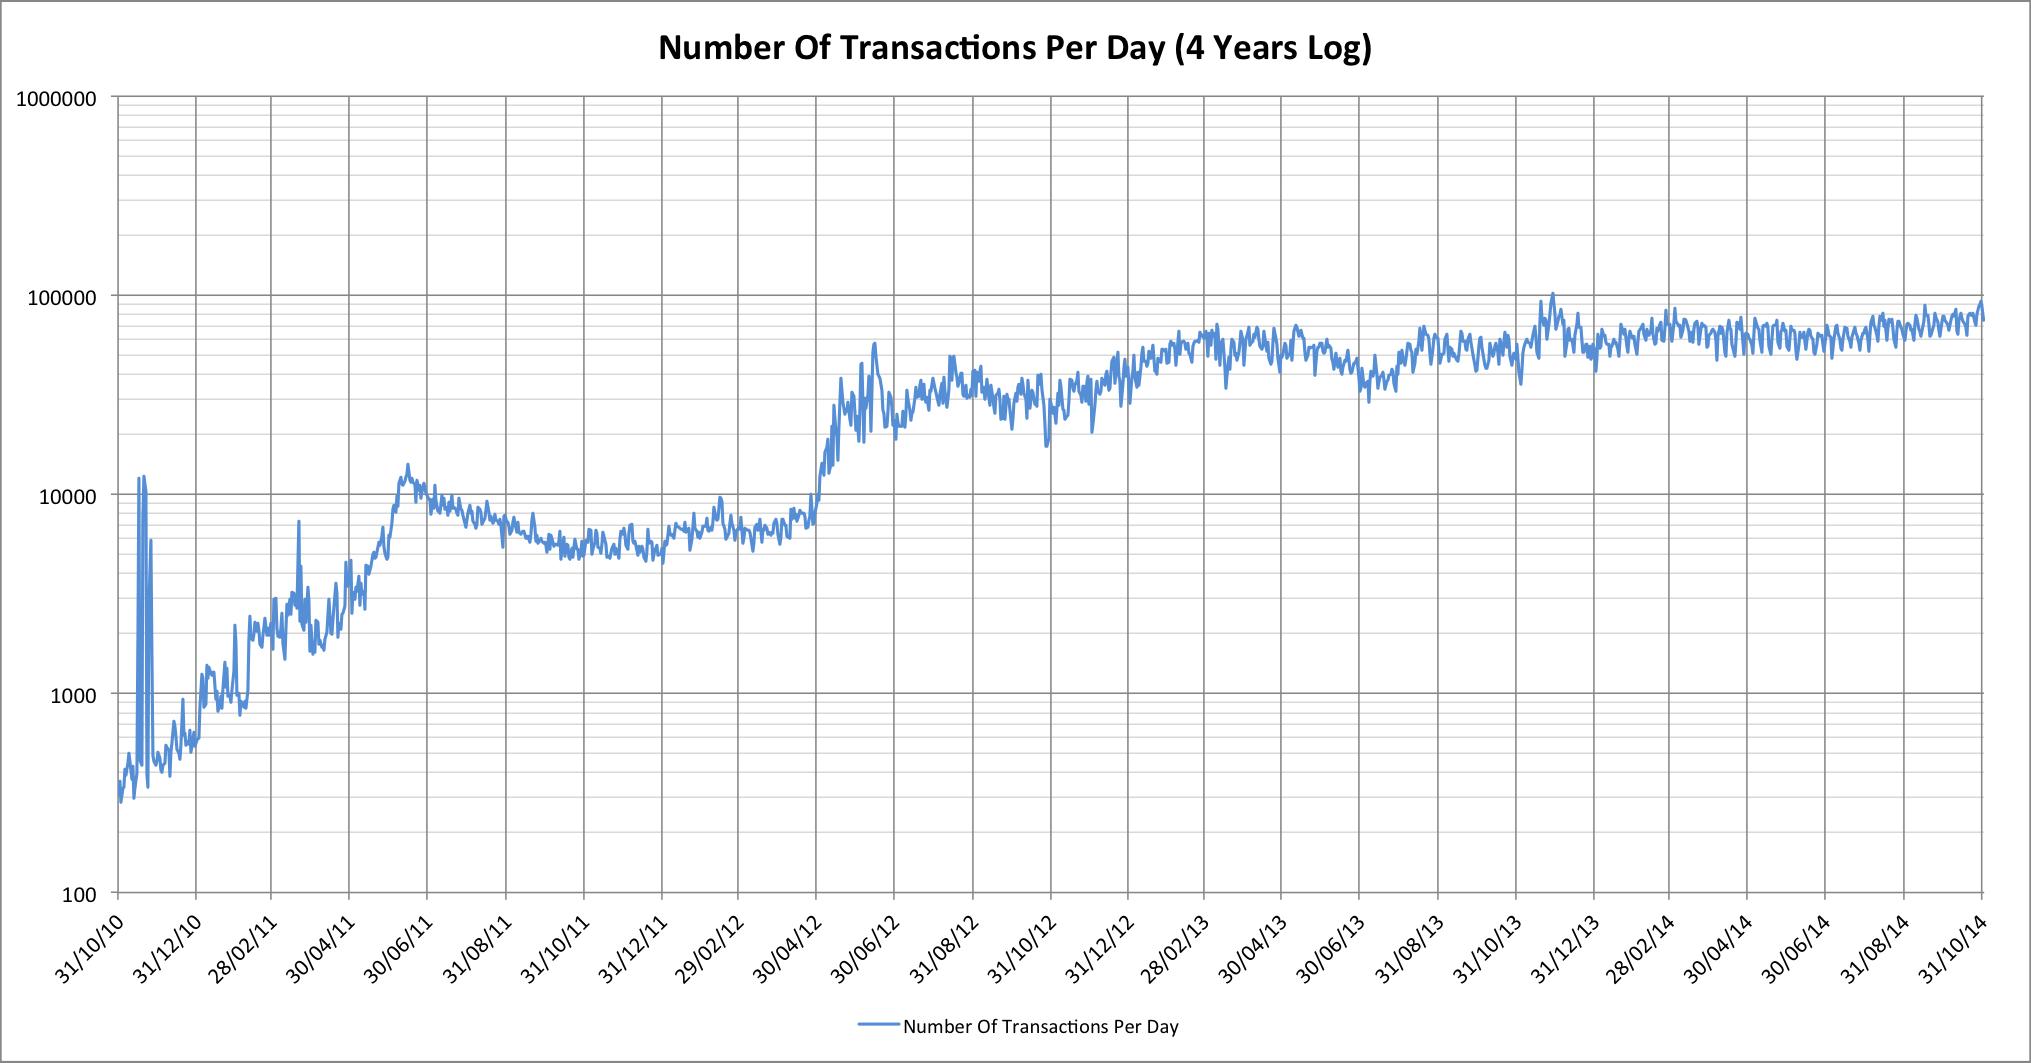 trans-per-day-log